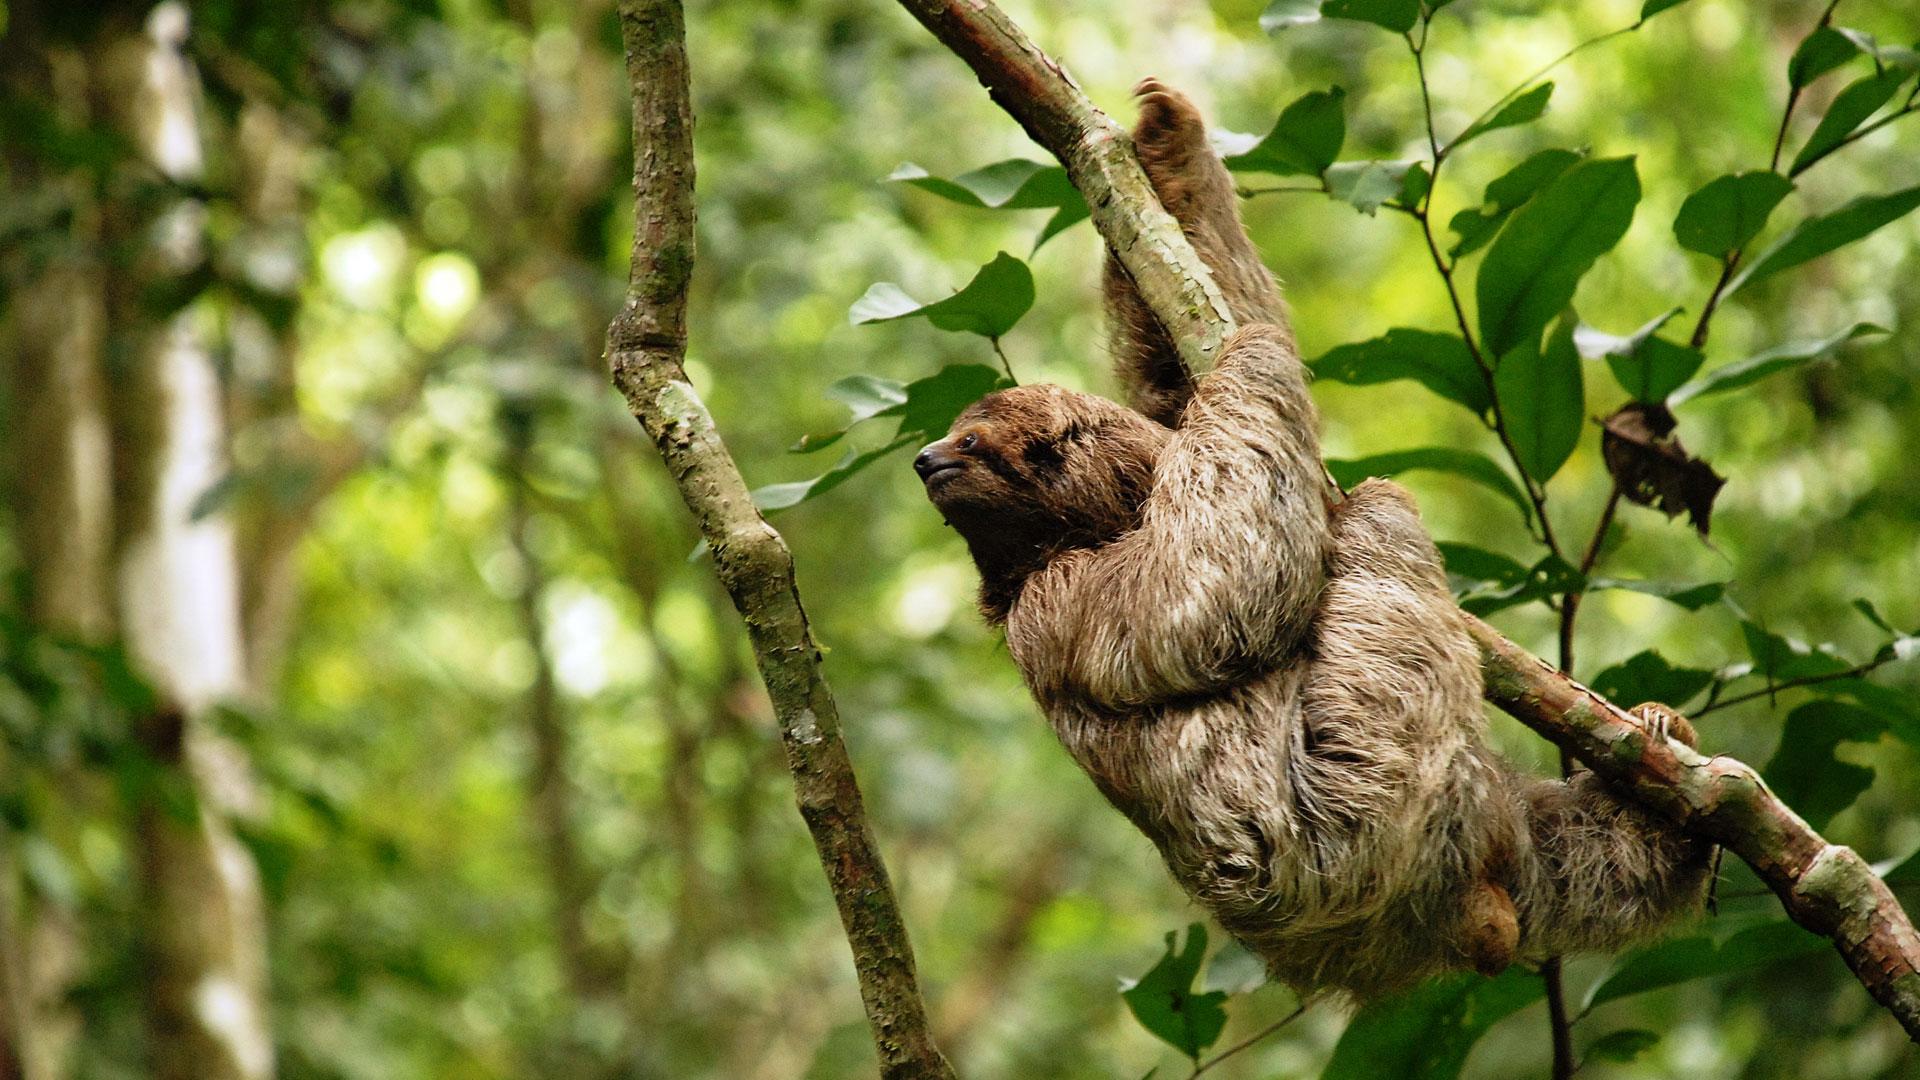 Top Ten Reasons to visit Costa Rica - CostaRica.org